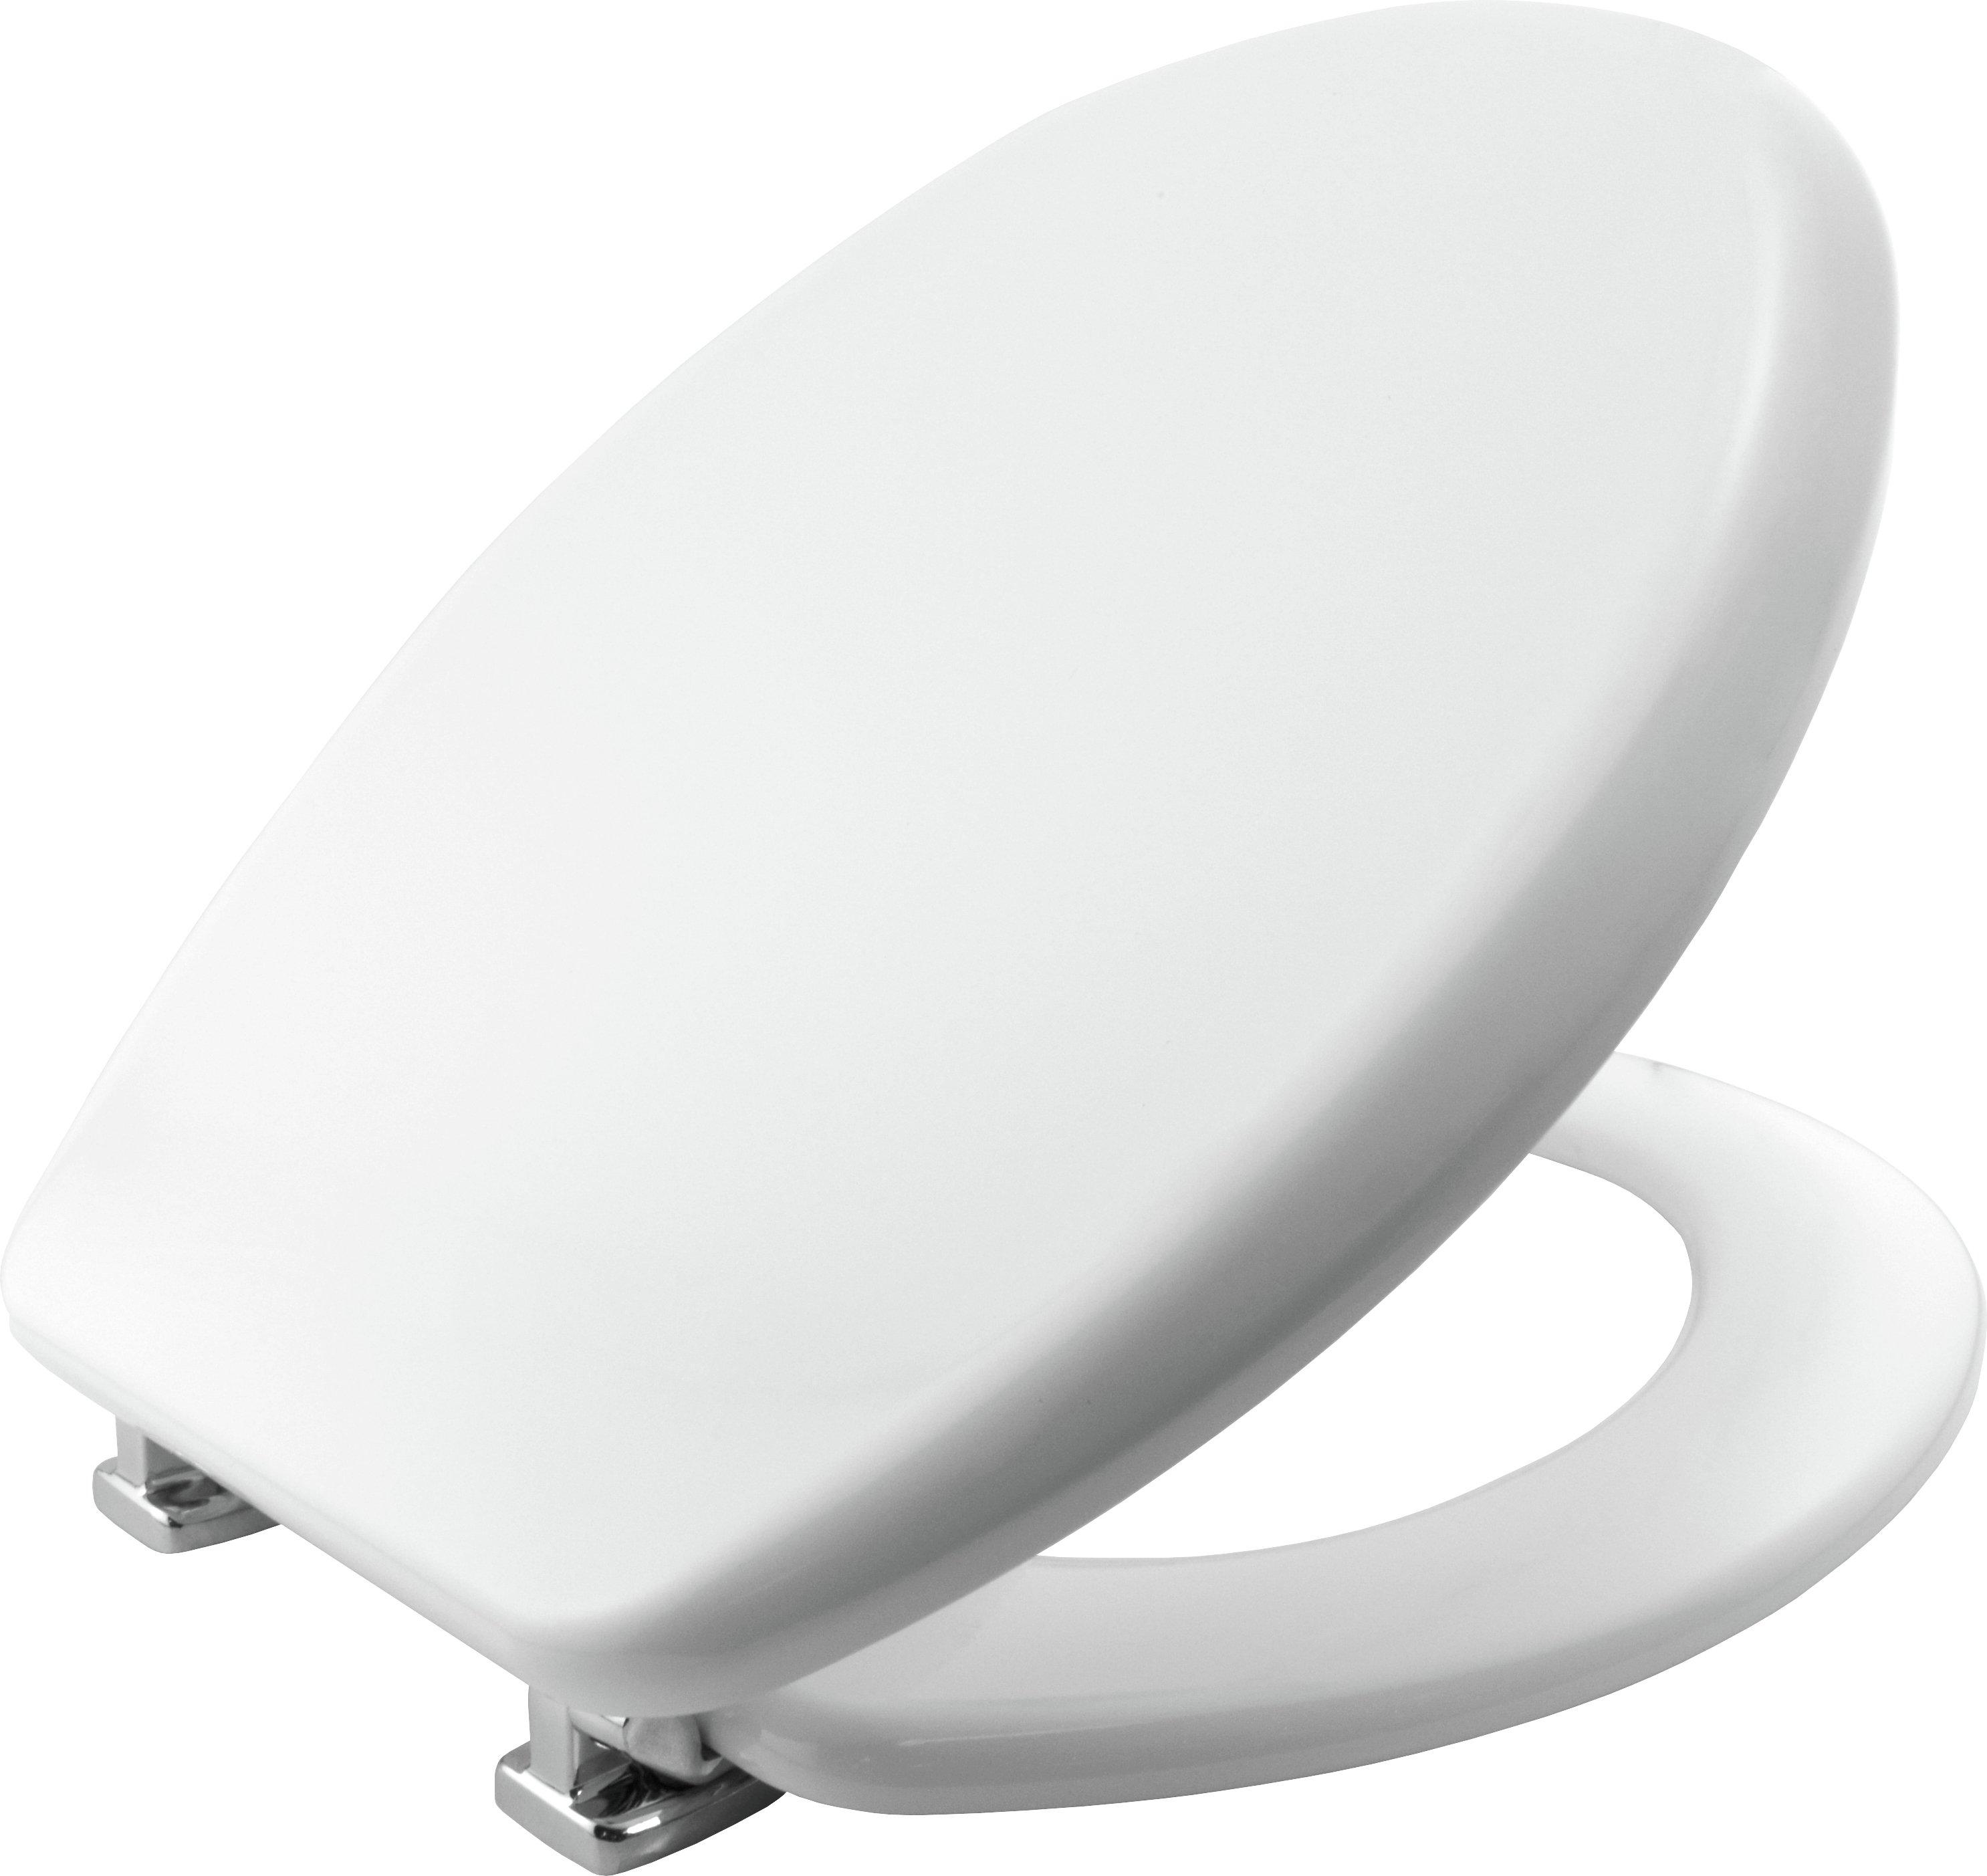 Prime Toilet Seats Page 6 Argos Price Tracker Pricehistory Co Uk Uwap Interior Chair Design Uwaporg